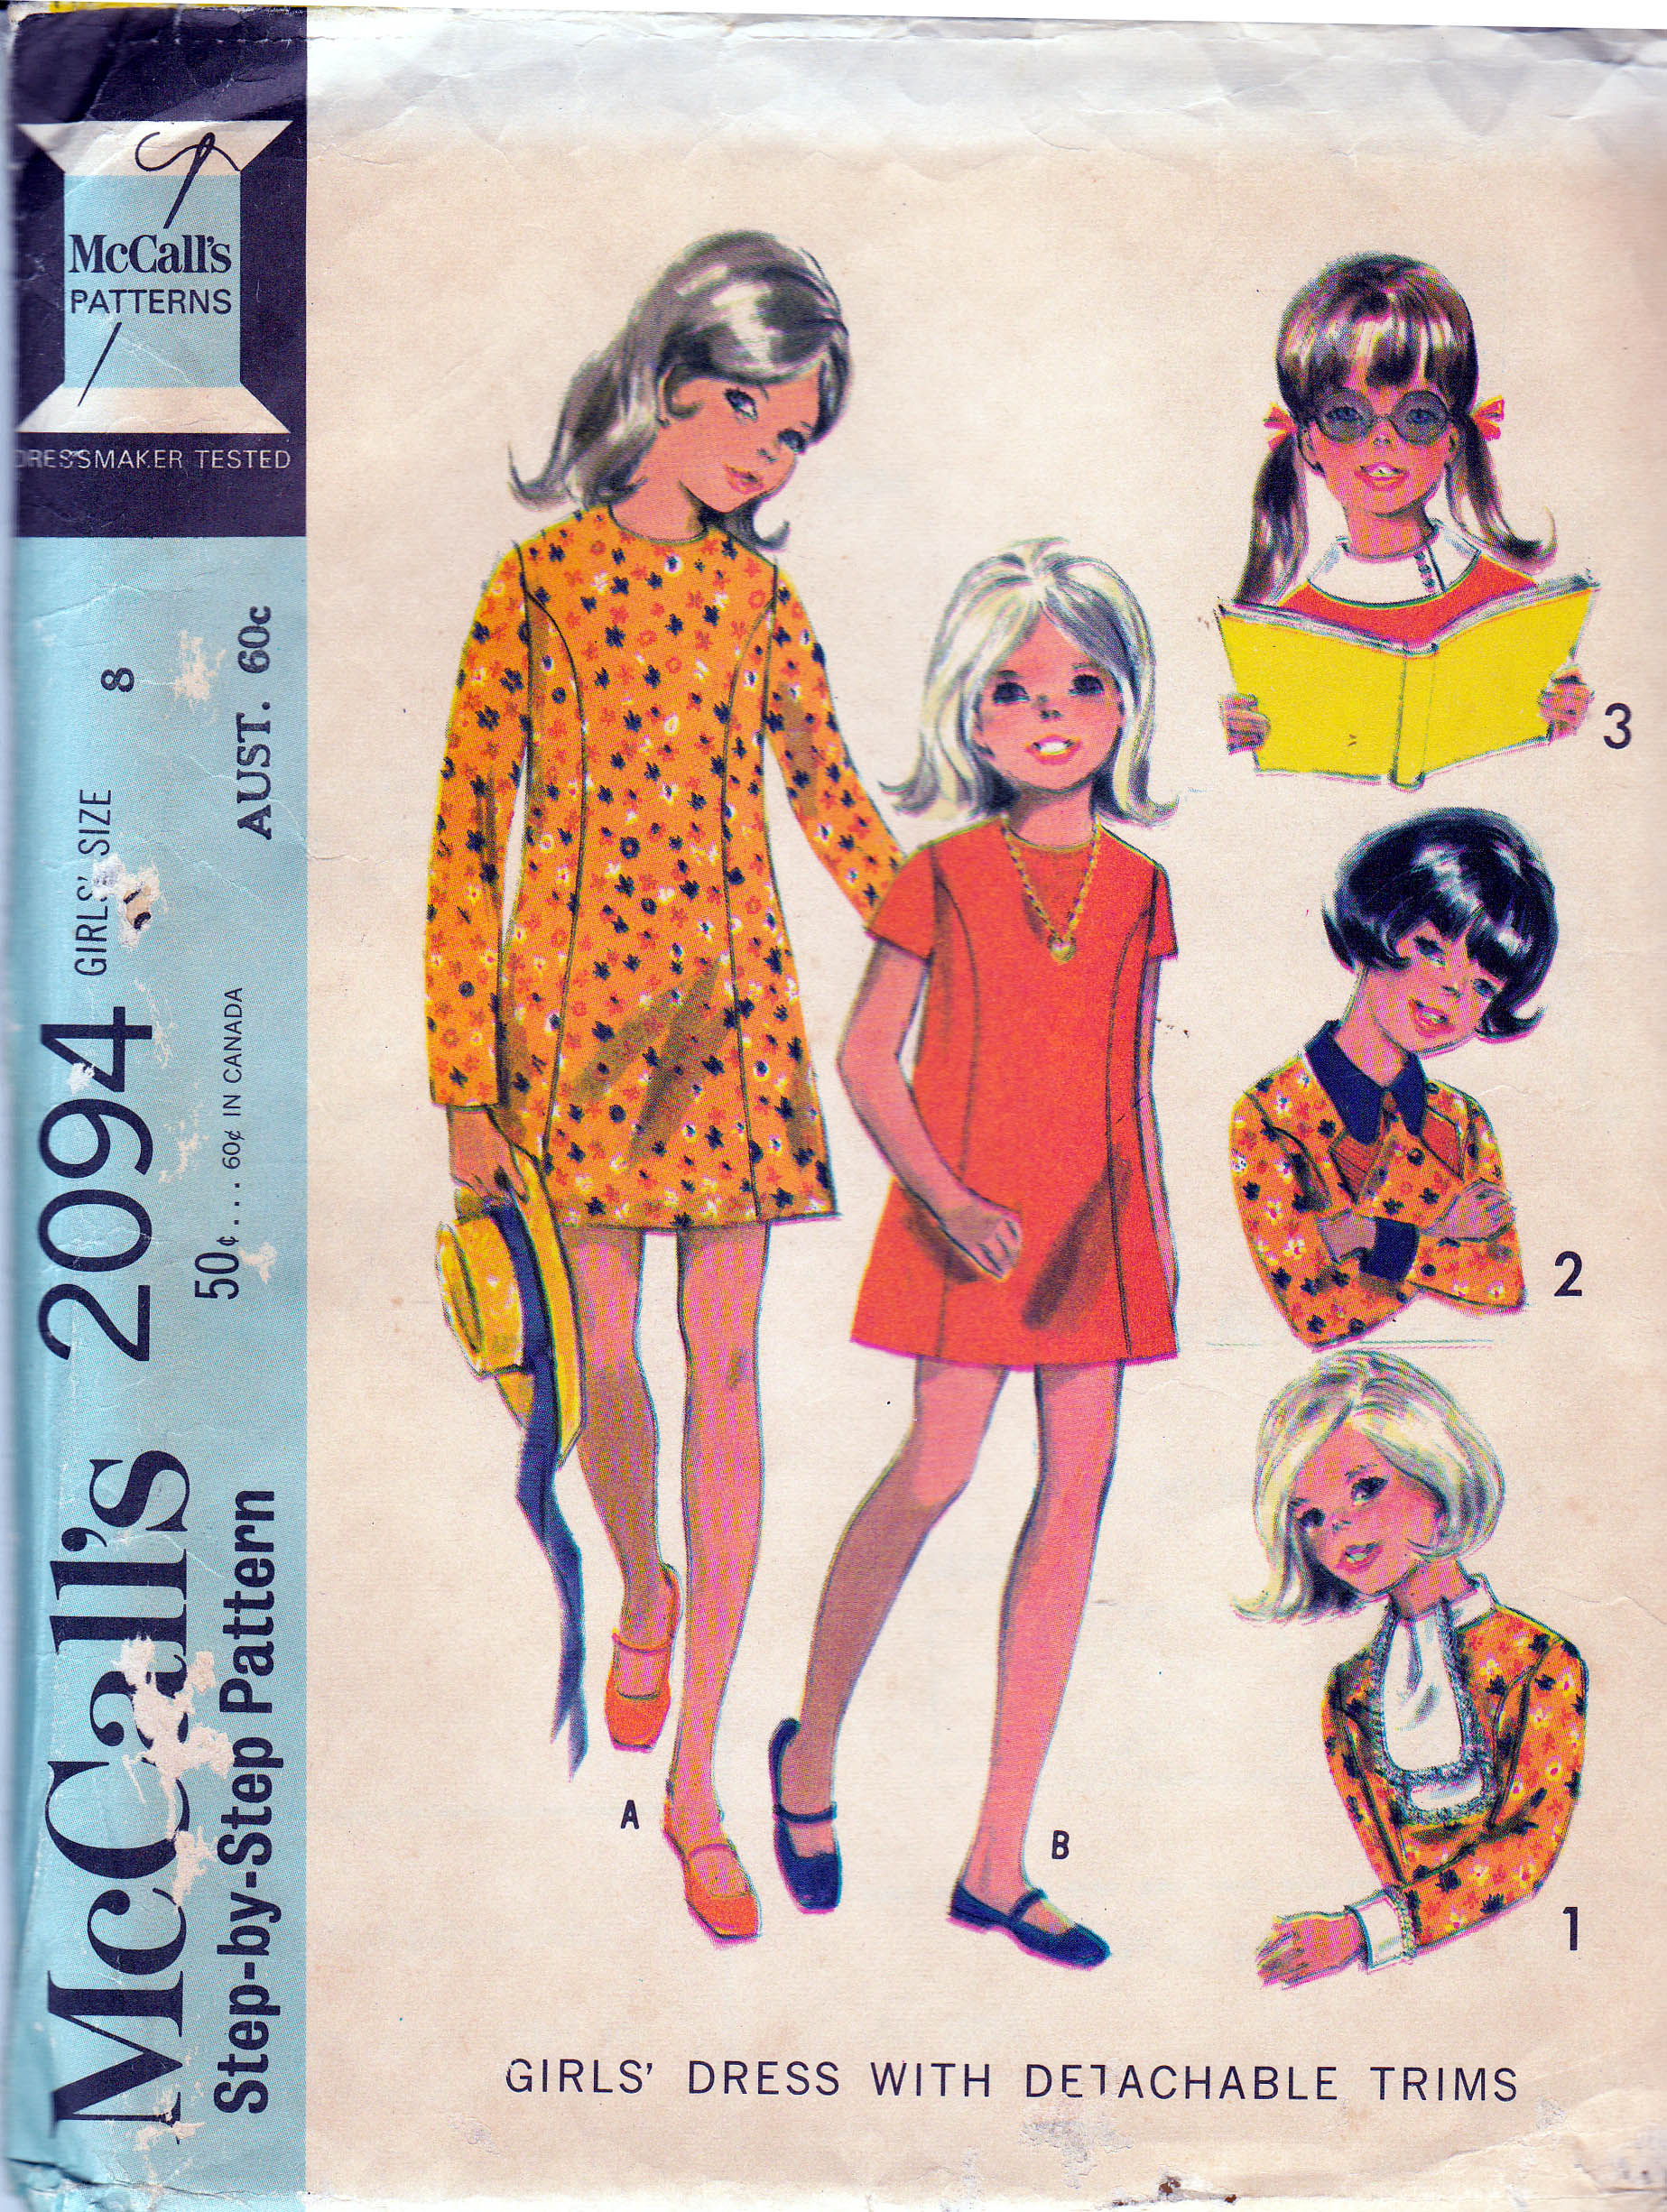 McCall's 2094